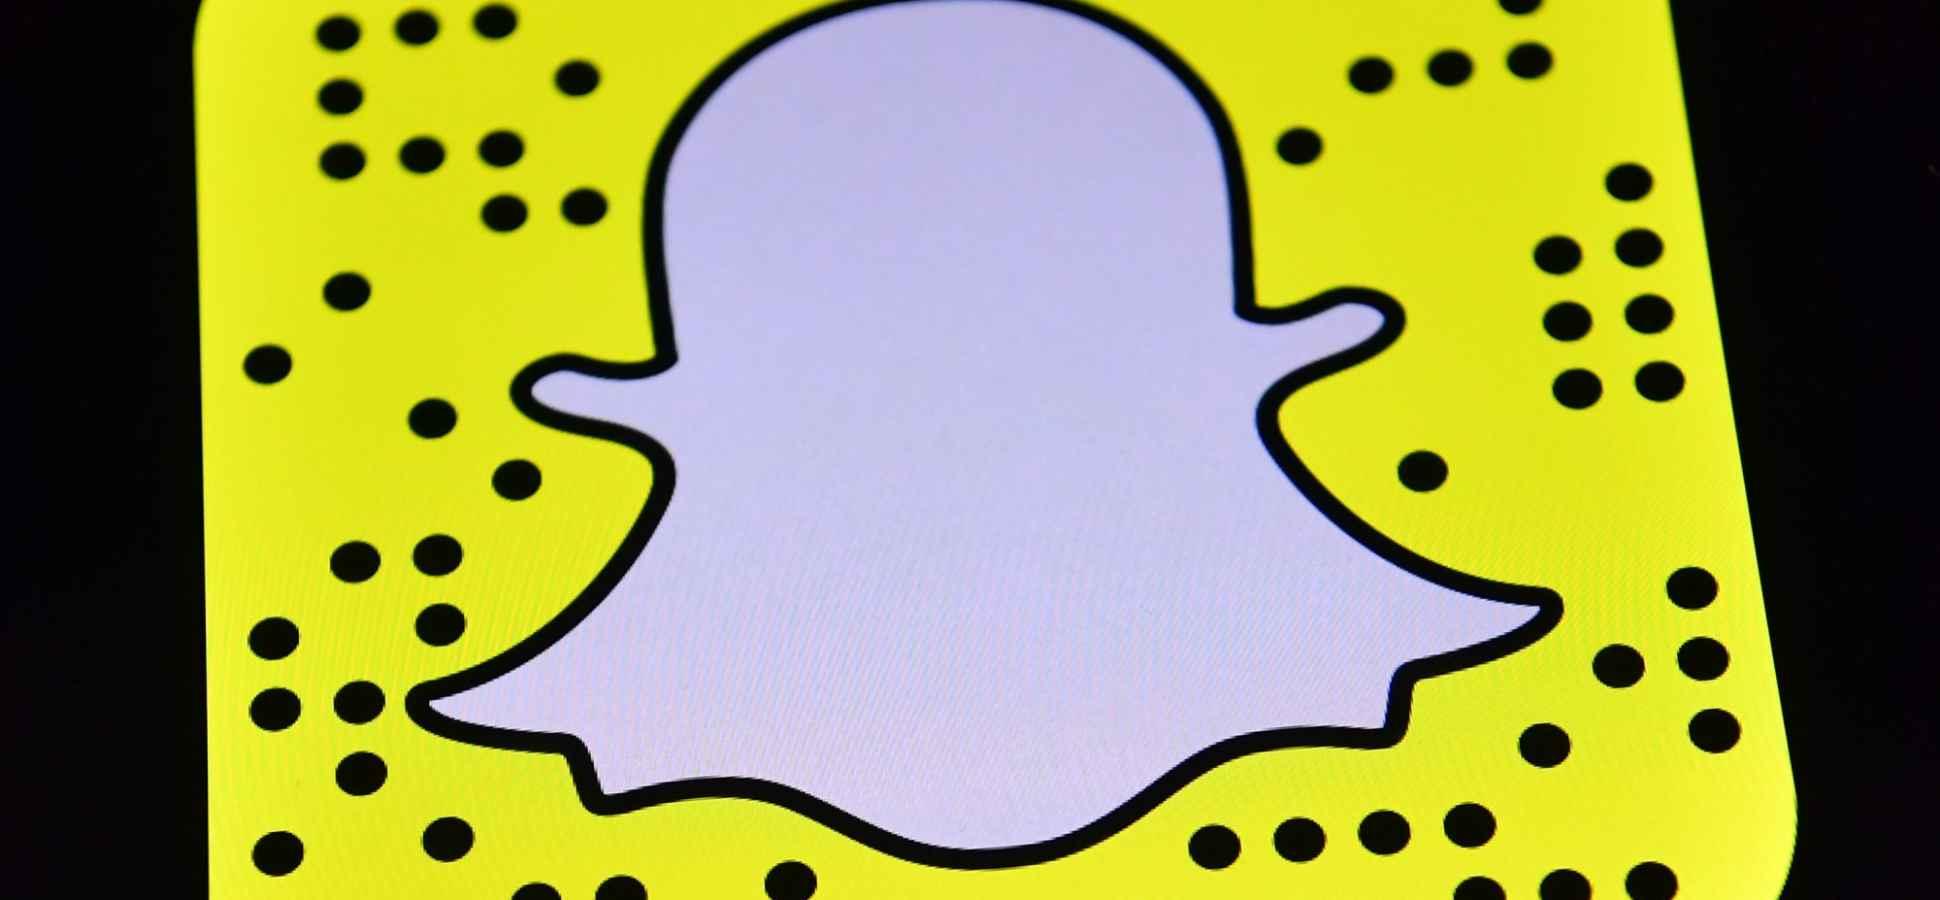 Morgan Stanley, Goldman Sachs Said to Lead Snapchat's $25 Billion IPO